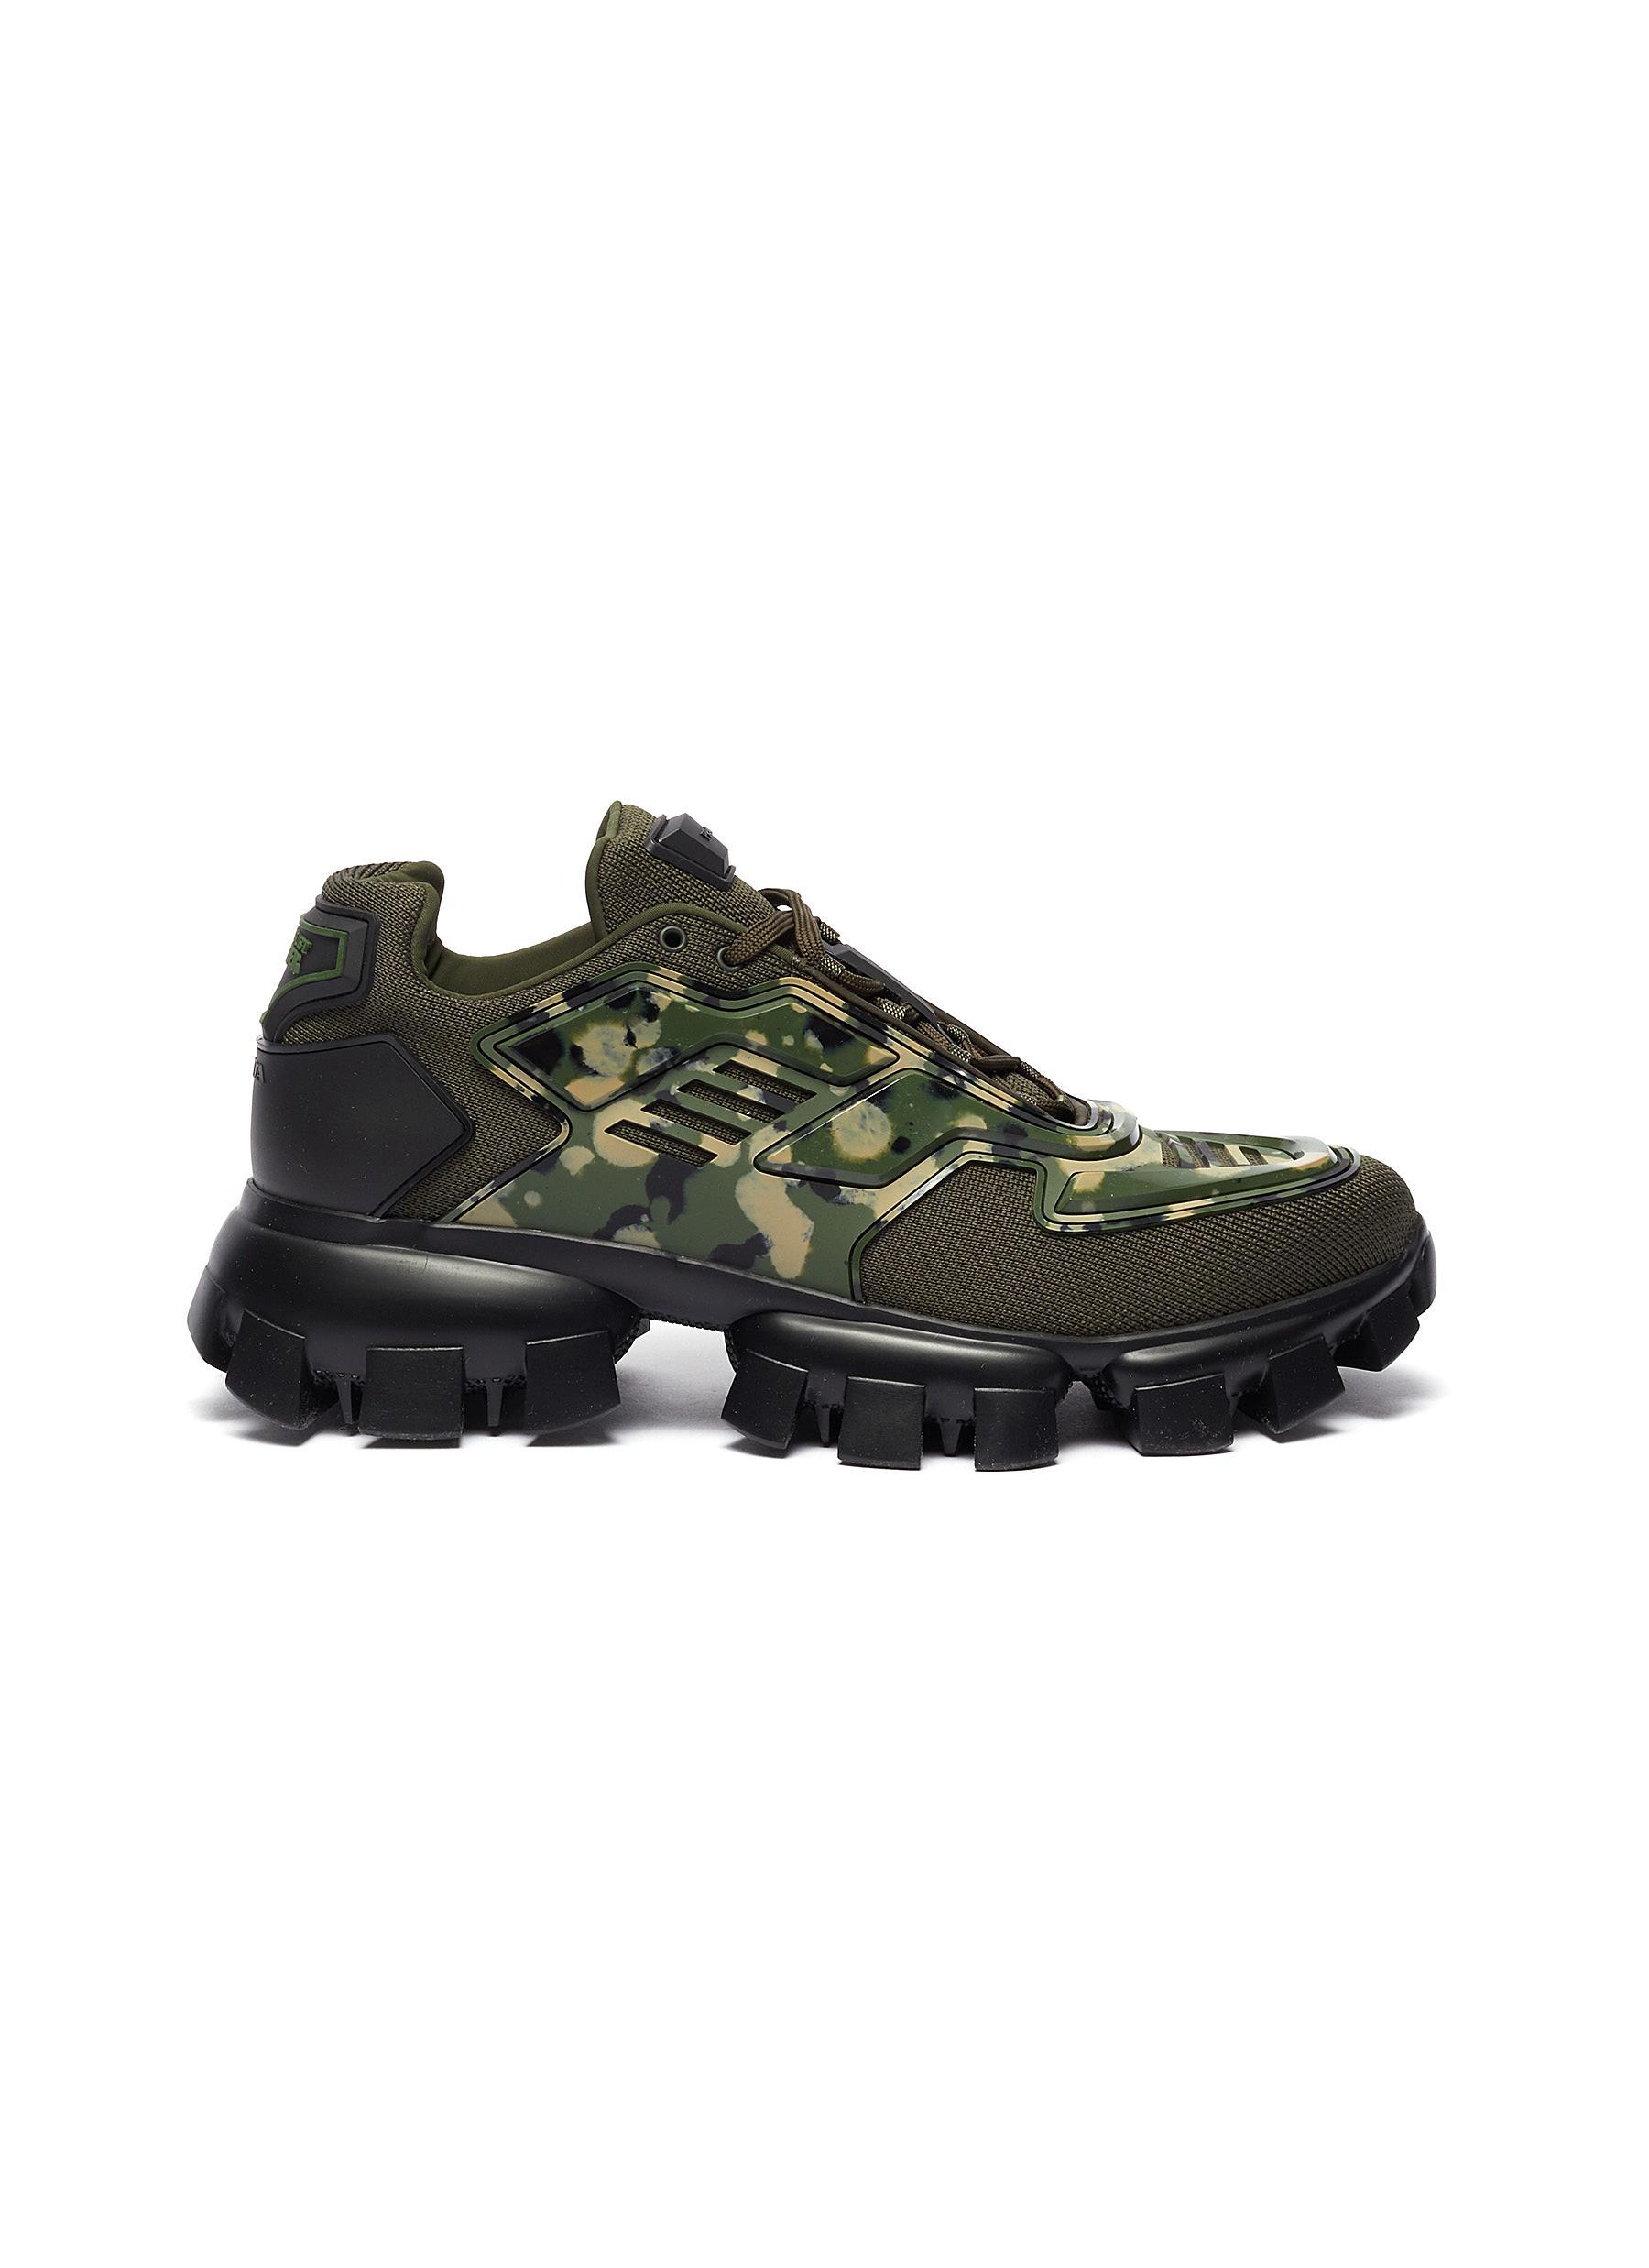 Prada Sneakers Cloudbust Thunder' camo sneakers